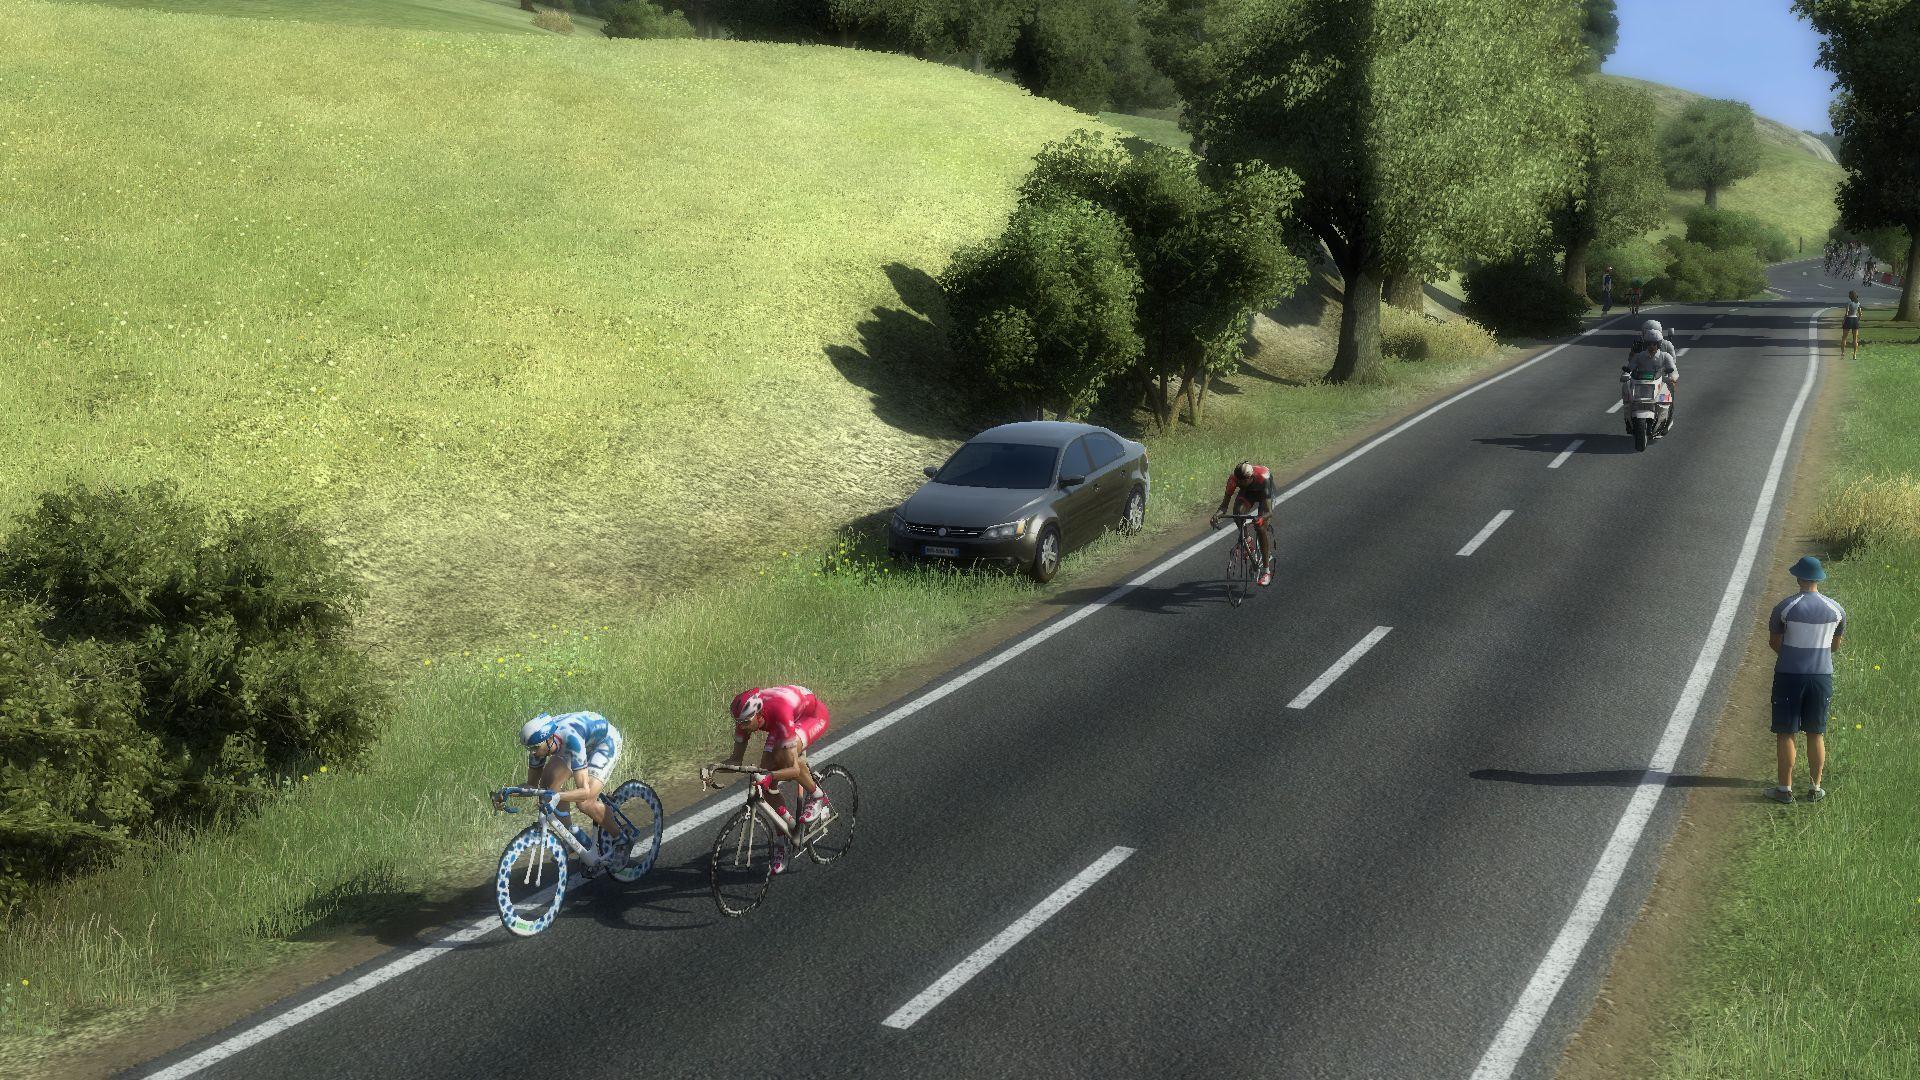 pcmdaily.com/images/mg/2018/Races/C2HC/Zuri/Zuri%2018.jpg